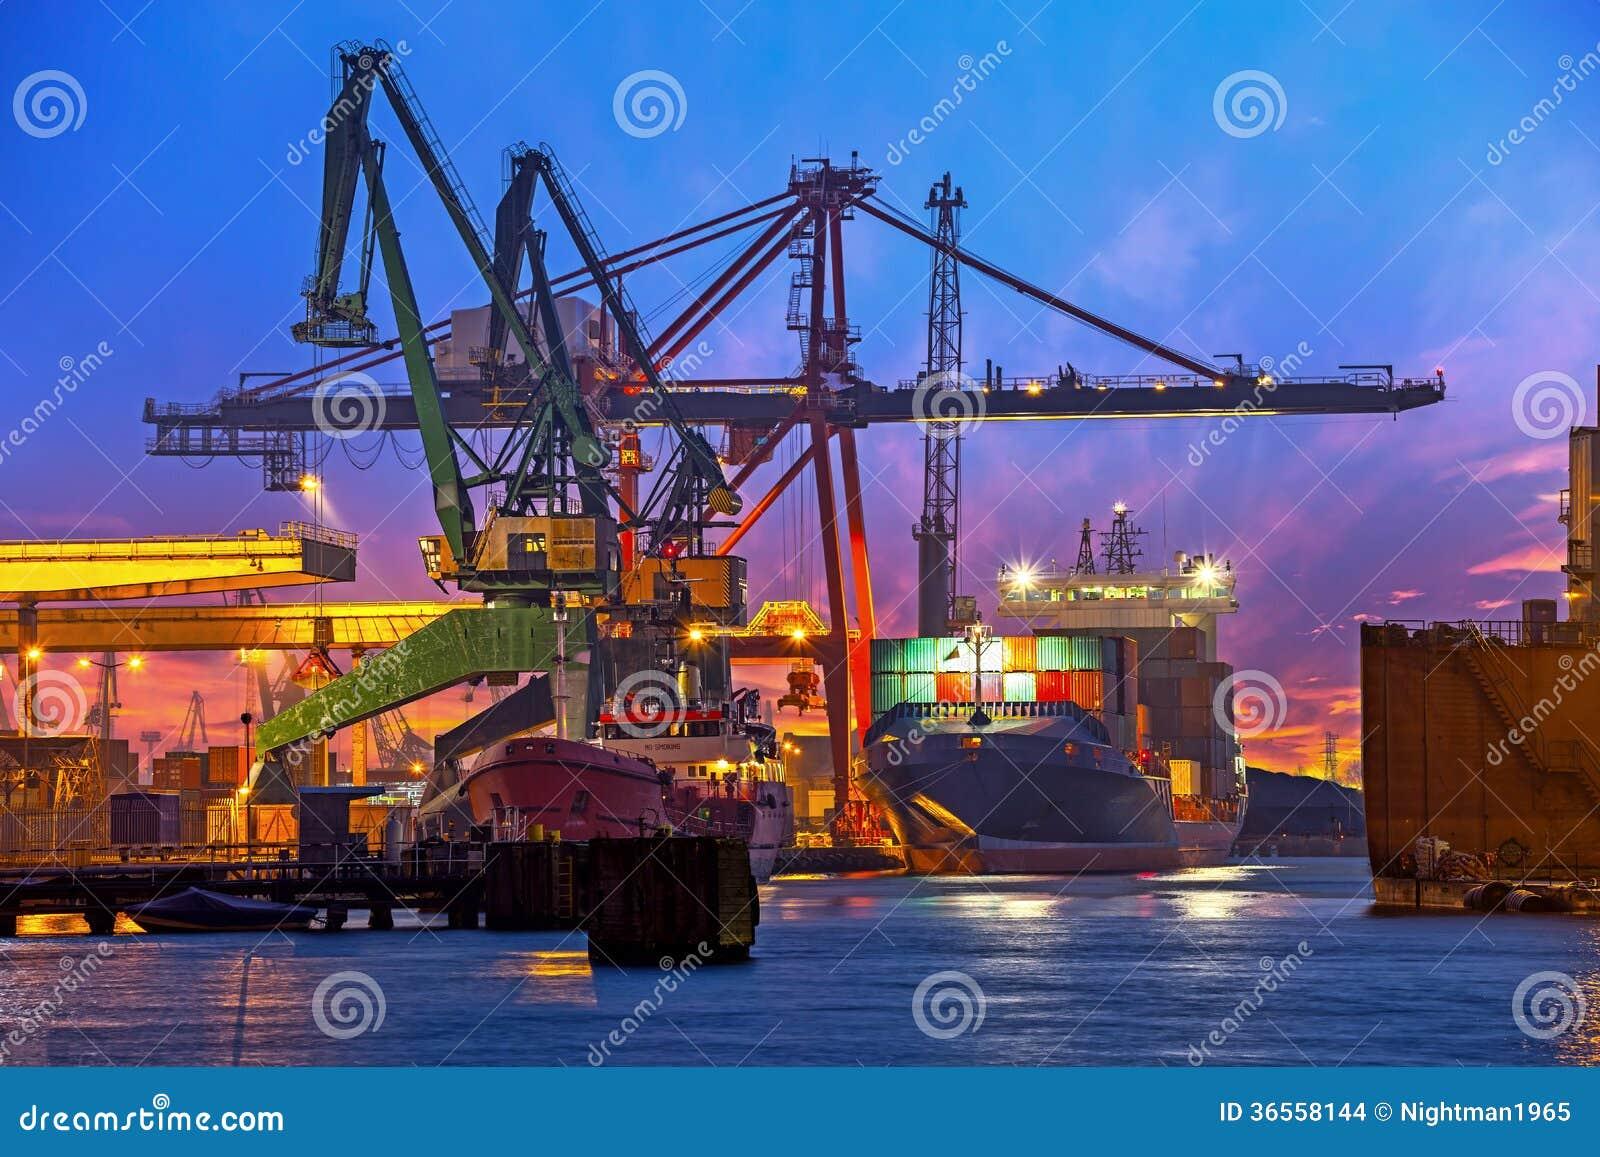 Harbor Freight Gantry Crane >> Big Cranes at sunset stock photo. Image of gdansk, poland ...